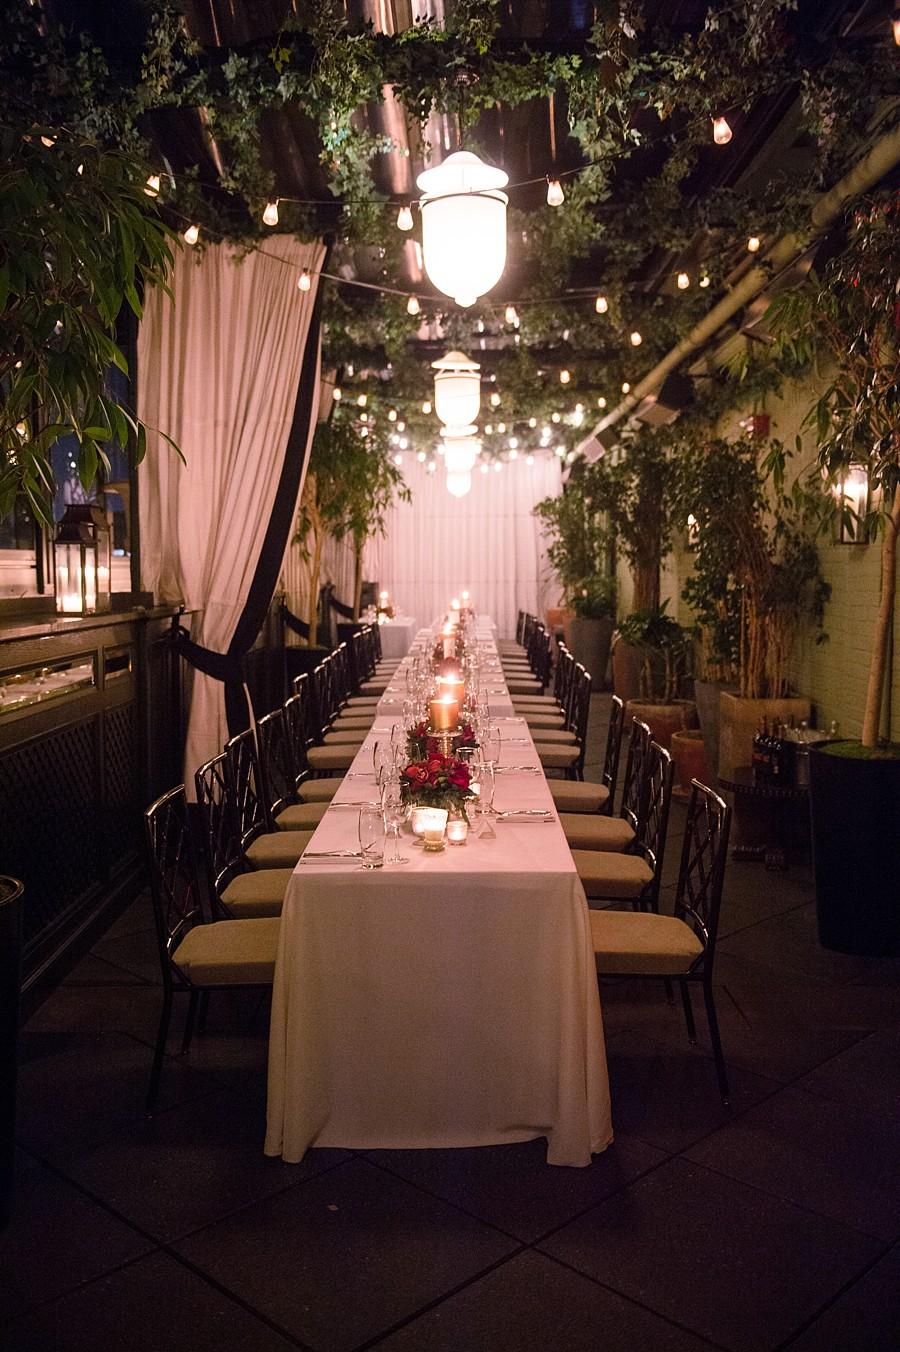 Gramercy_Park_Hotel_Wedding_NYC_FS_31.jpg